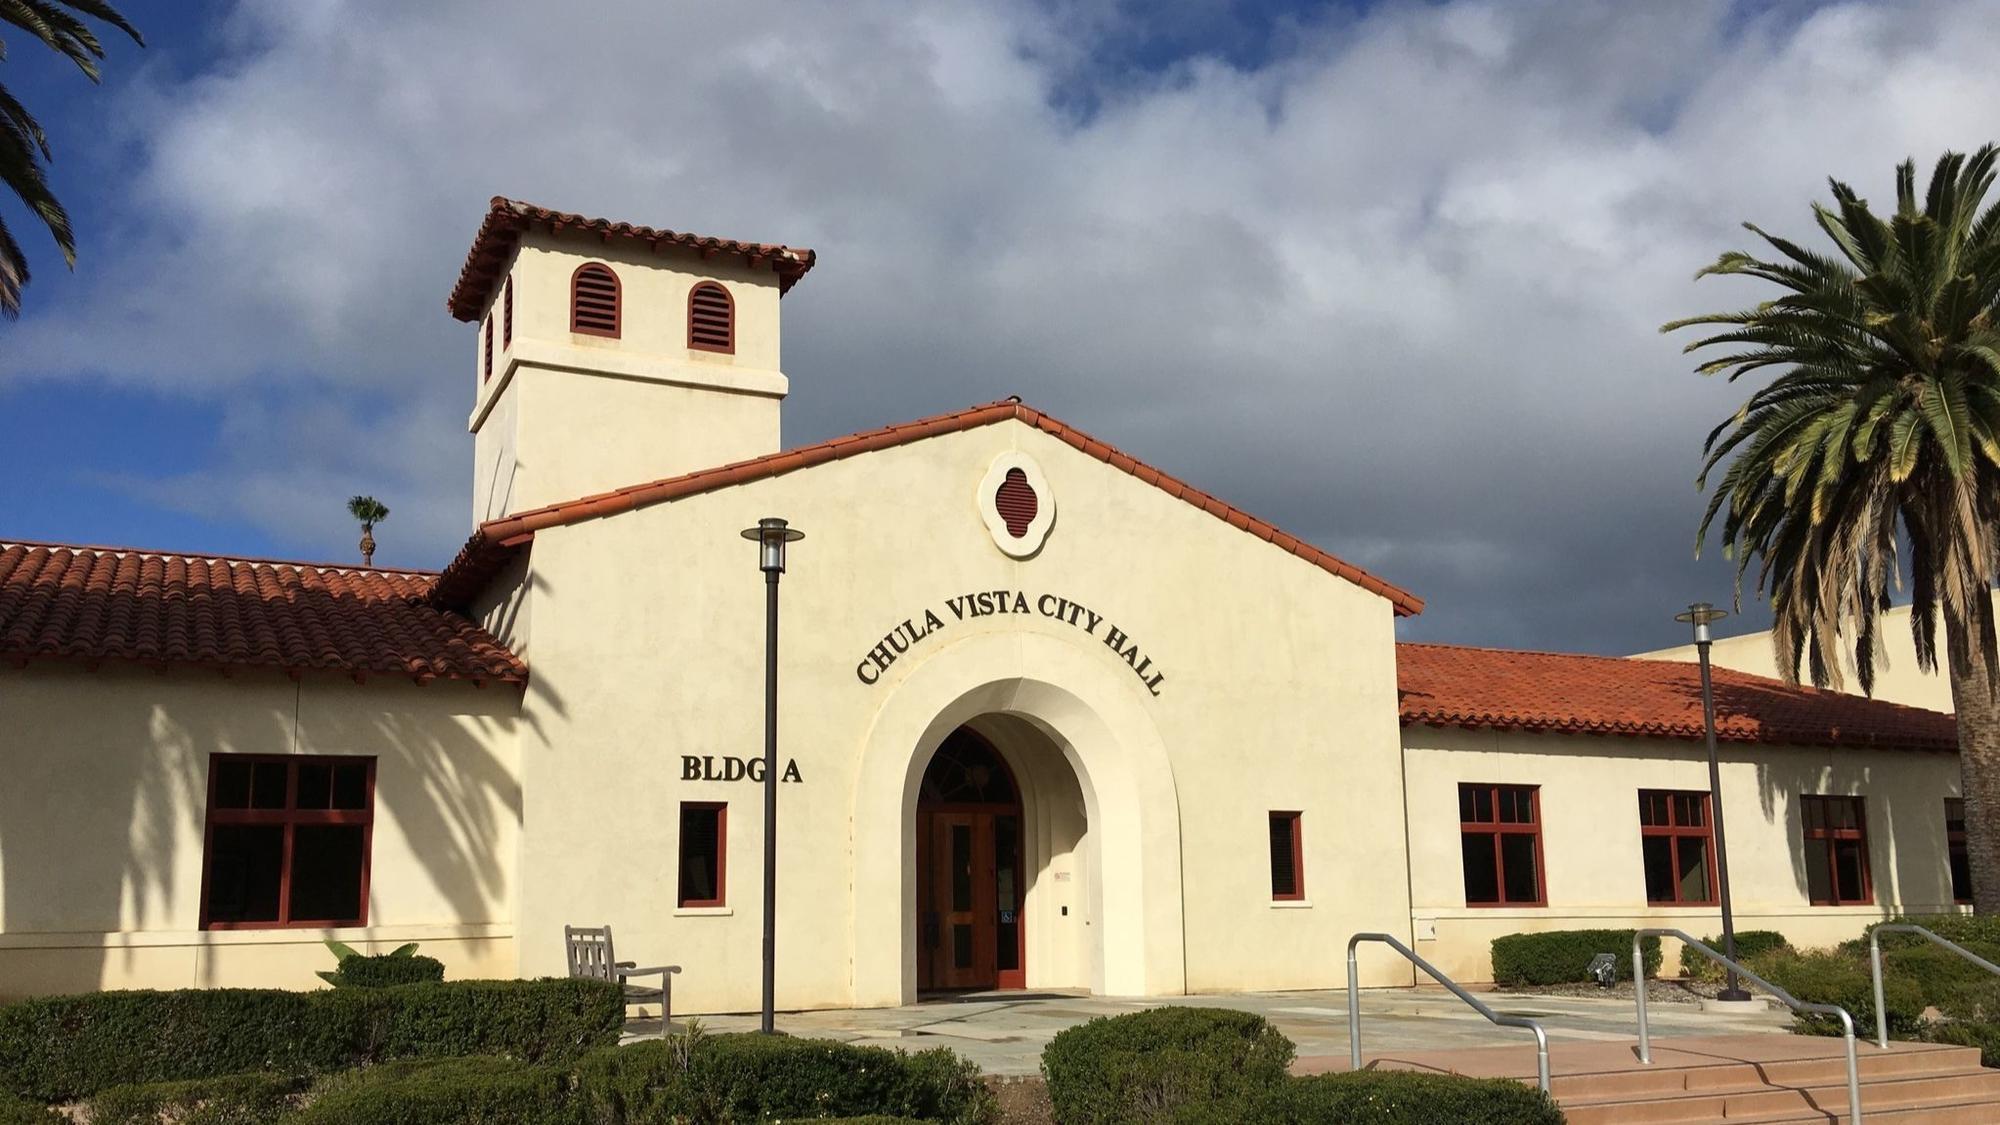 Chula Vista Neighborhood News